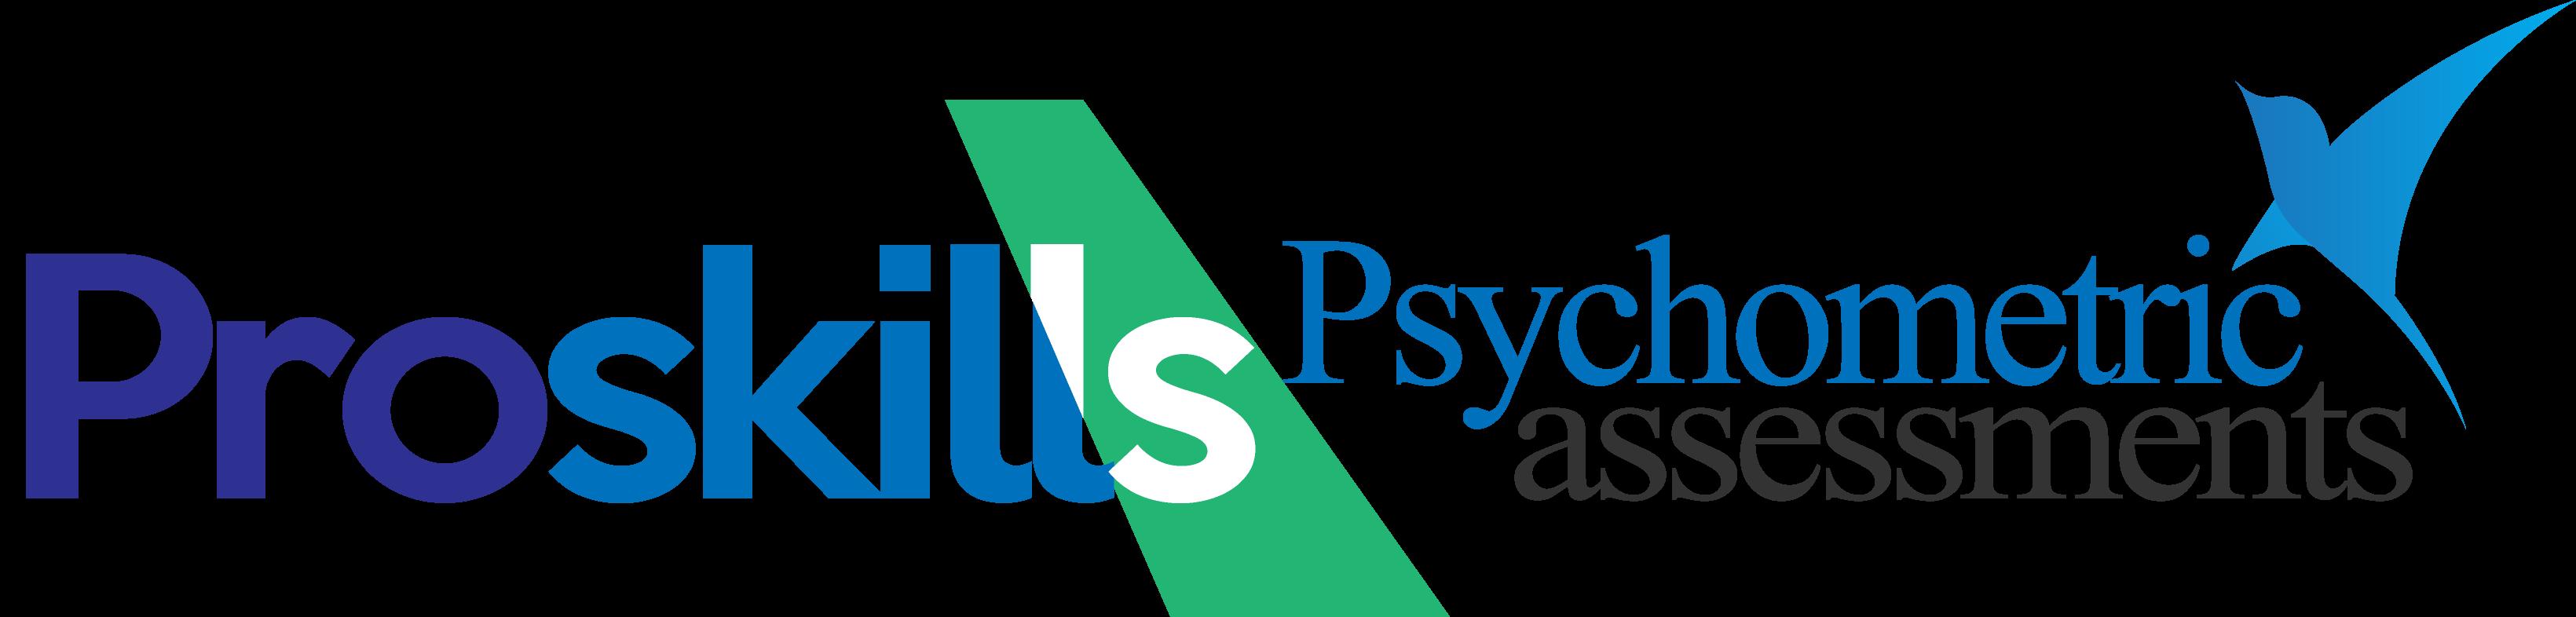 Proskills Psychometric Assessments